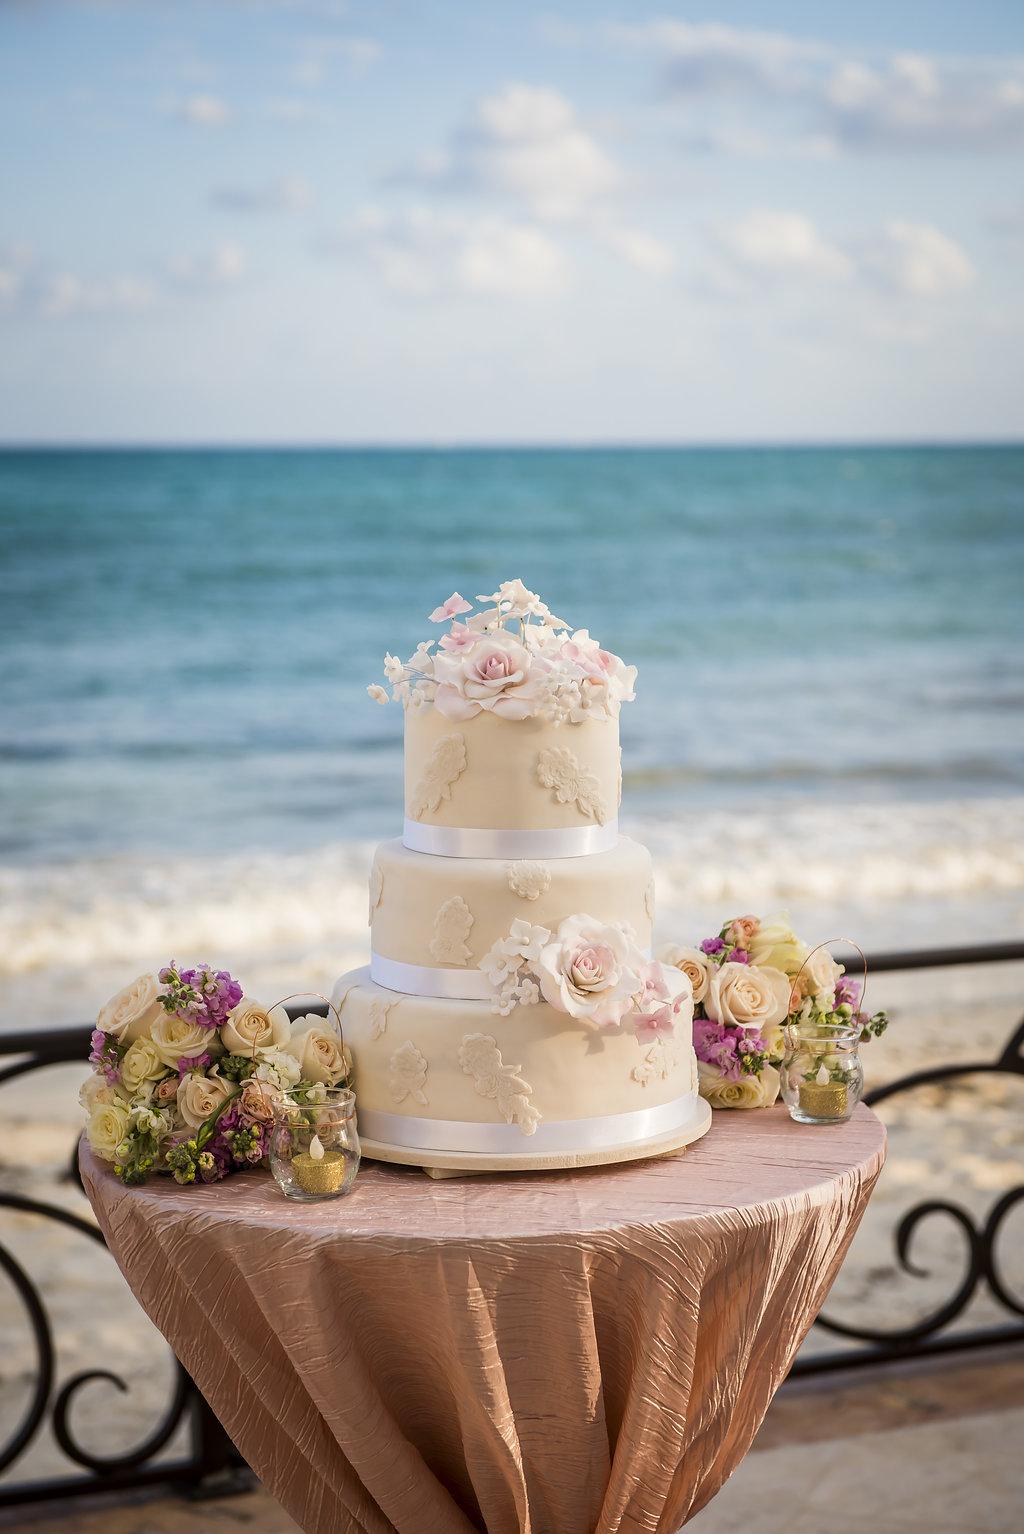 yesica-jose-beach-wedding-Villa-La-Joya--Playa-del-carmen-01--29.jpg